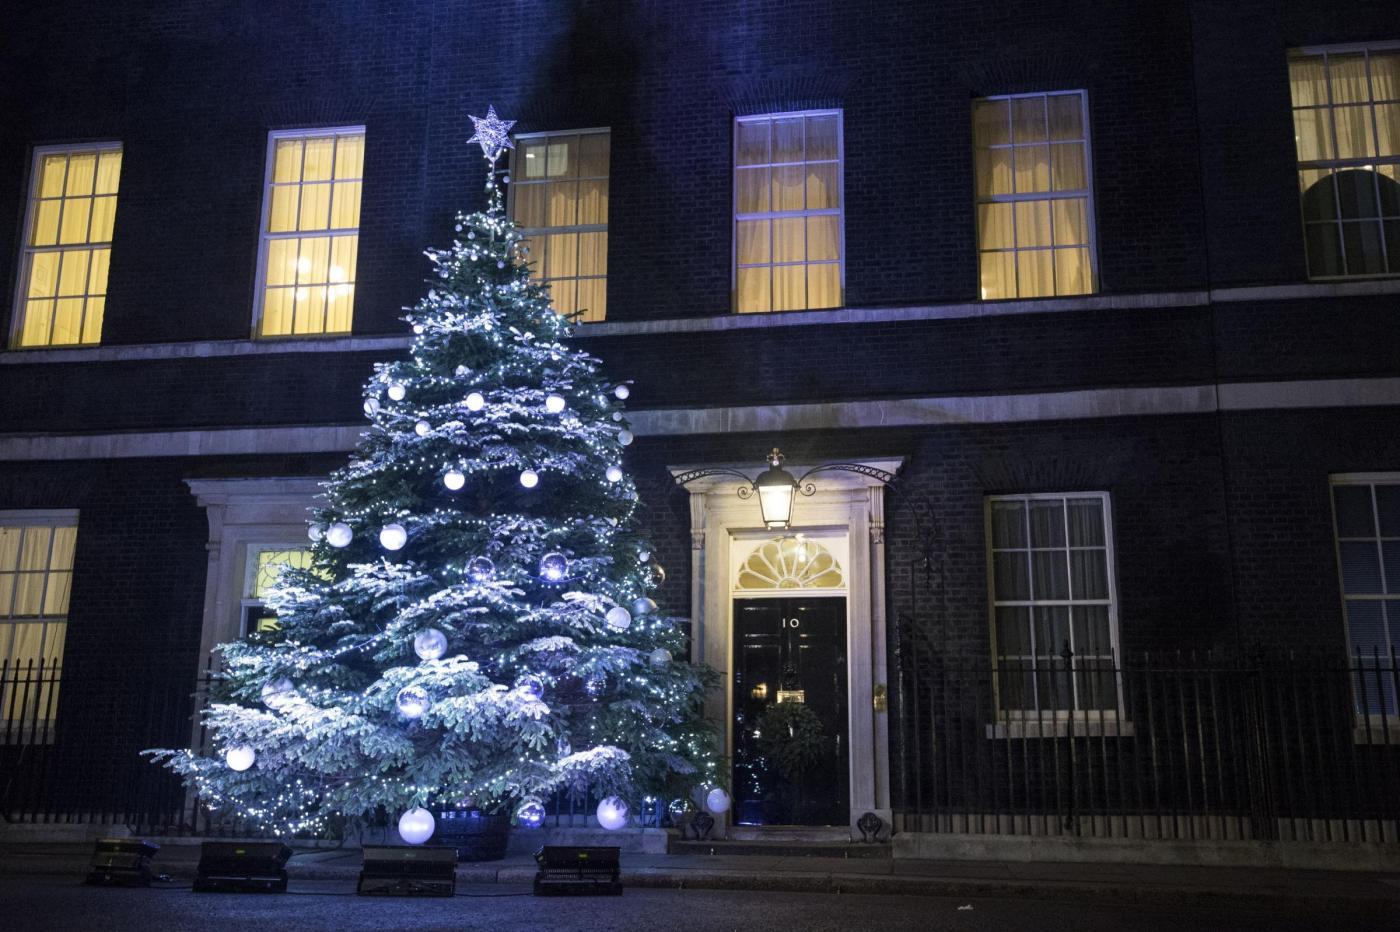 Downing Street Christmas tree